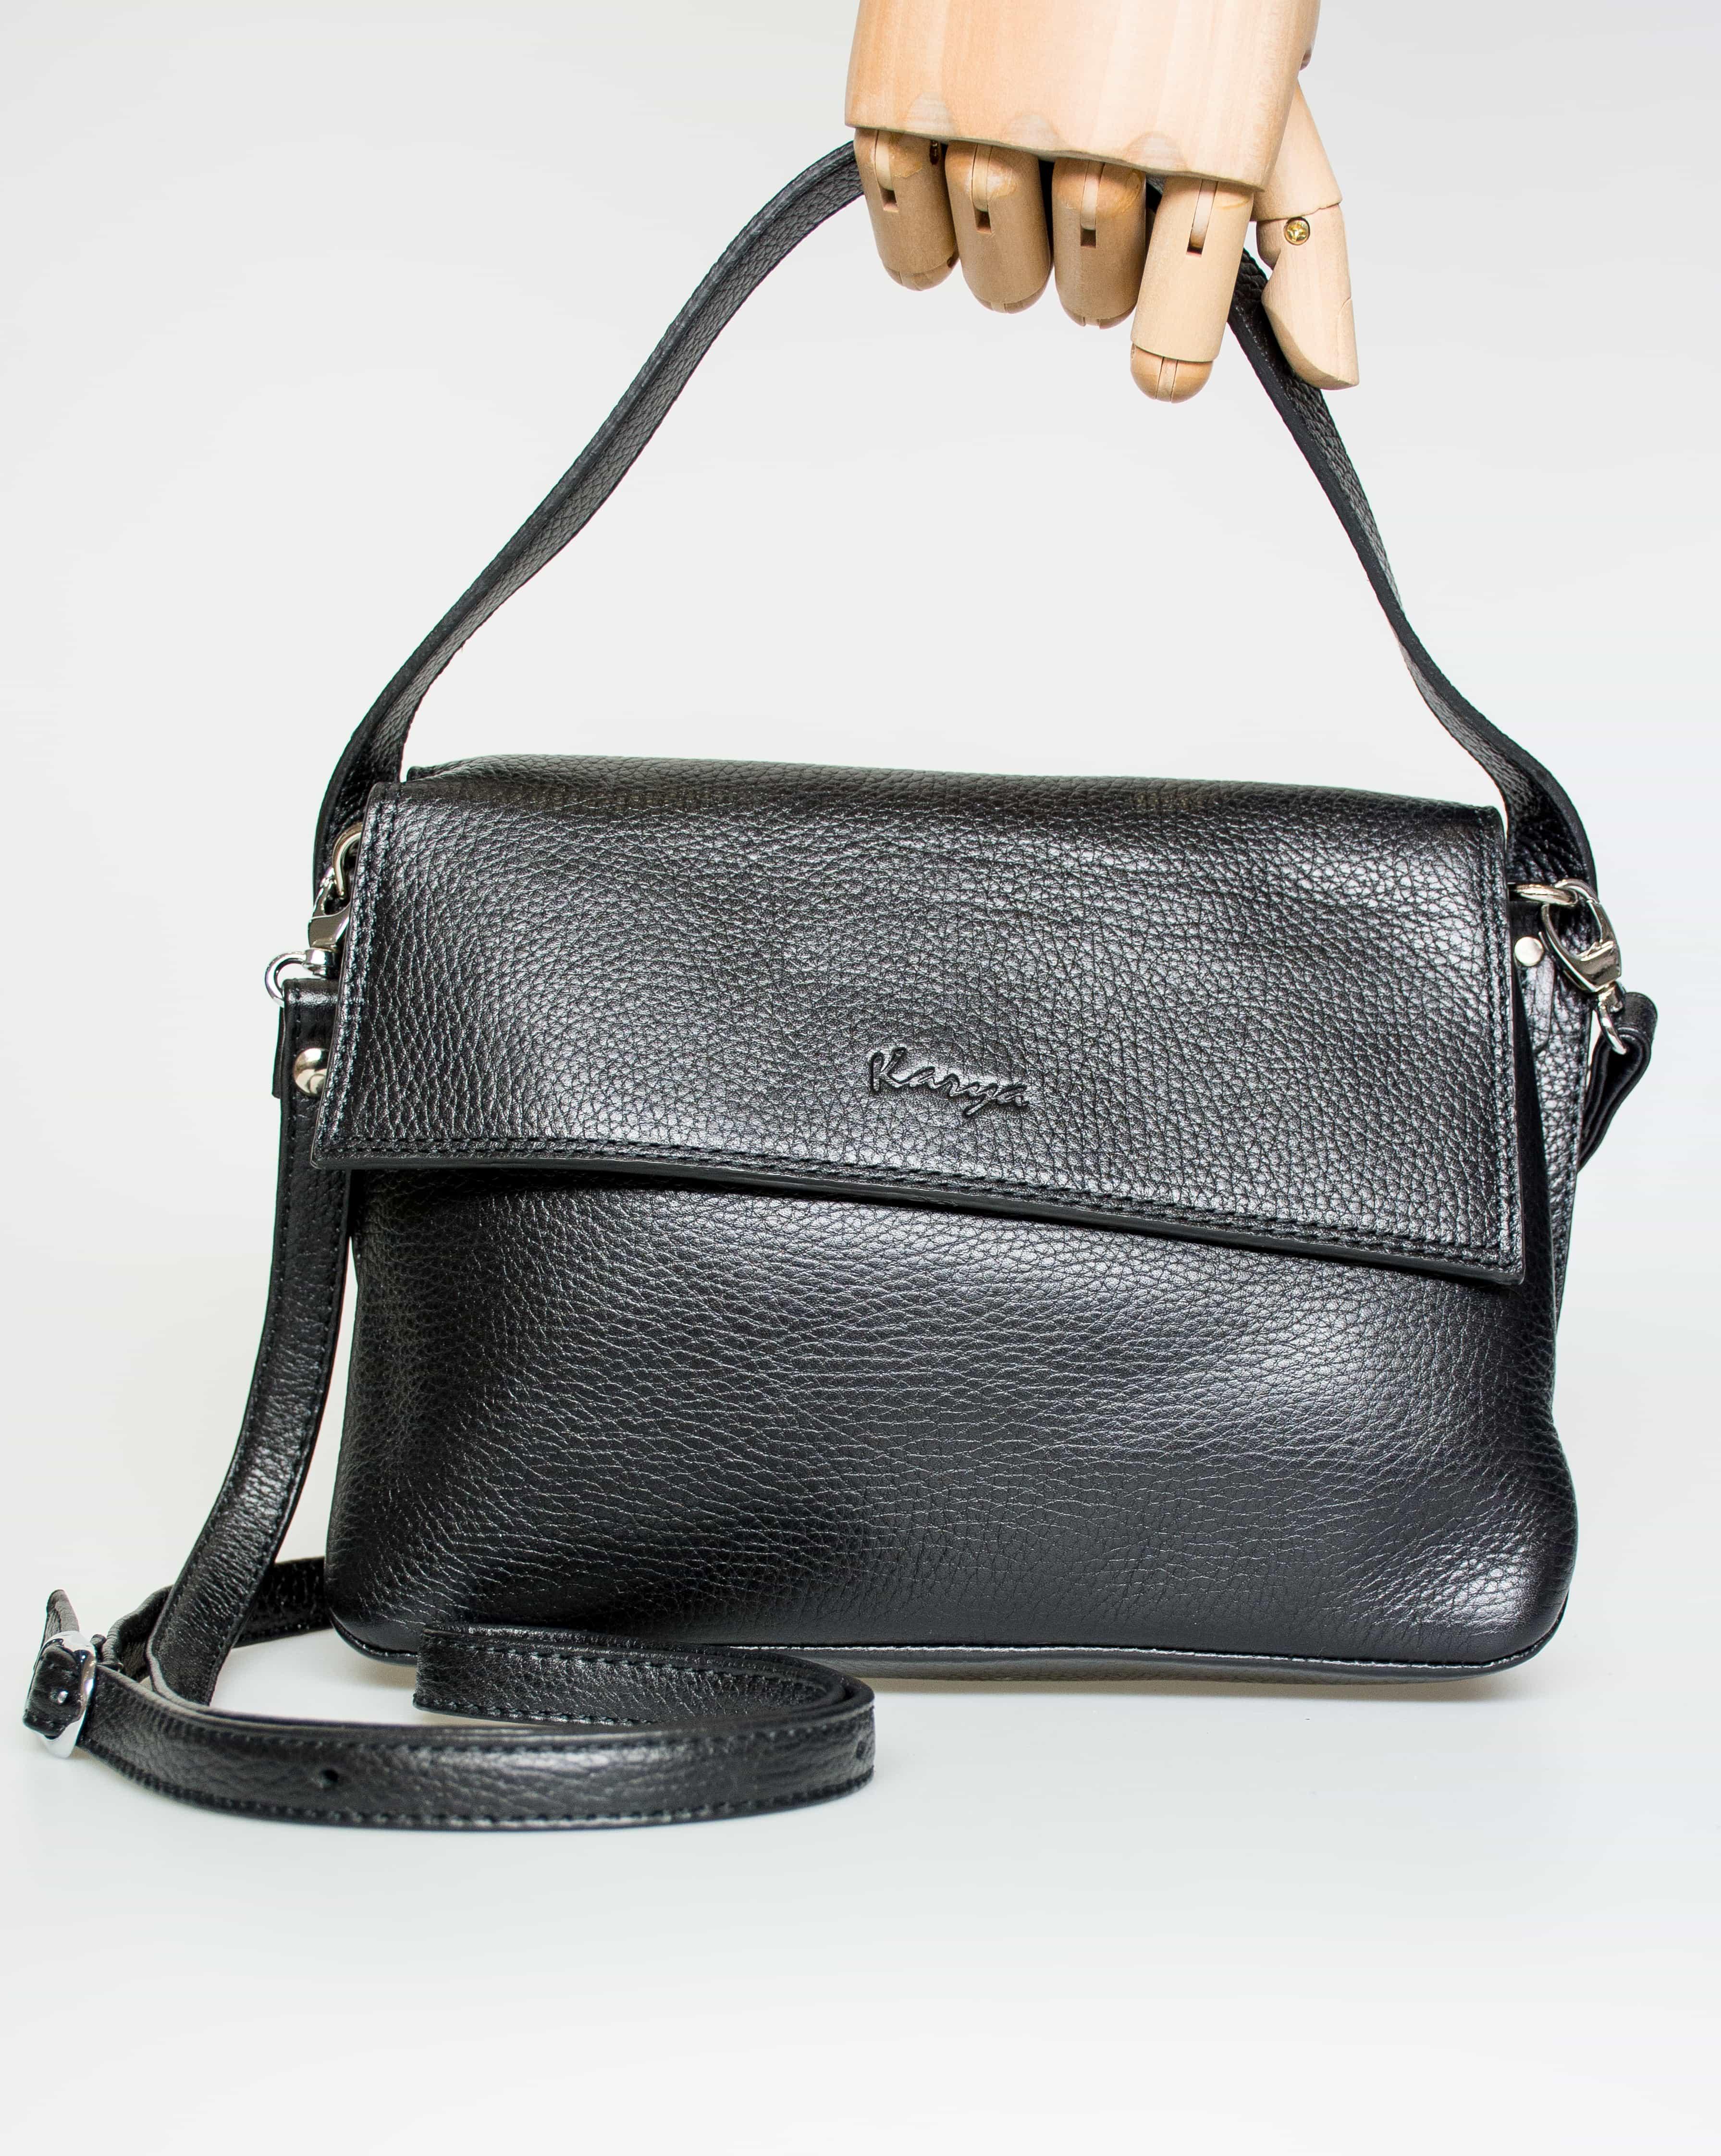 Женская кожаная сумка KARYA 0768-45